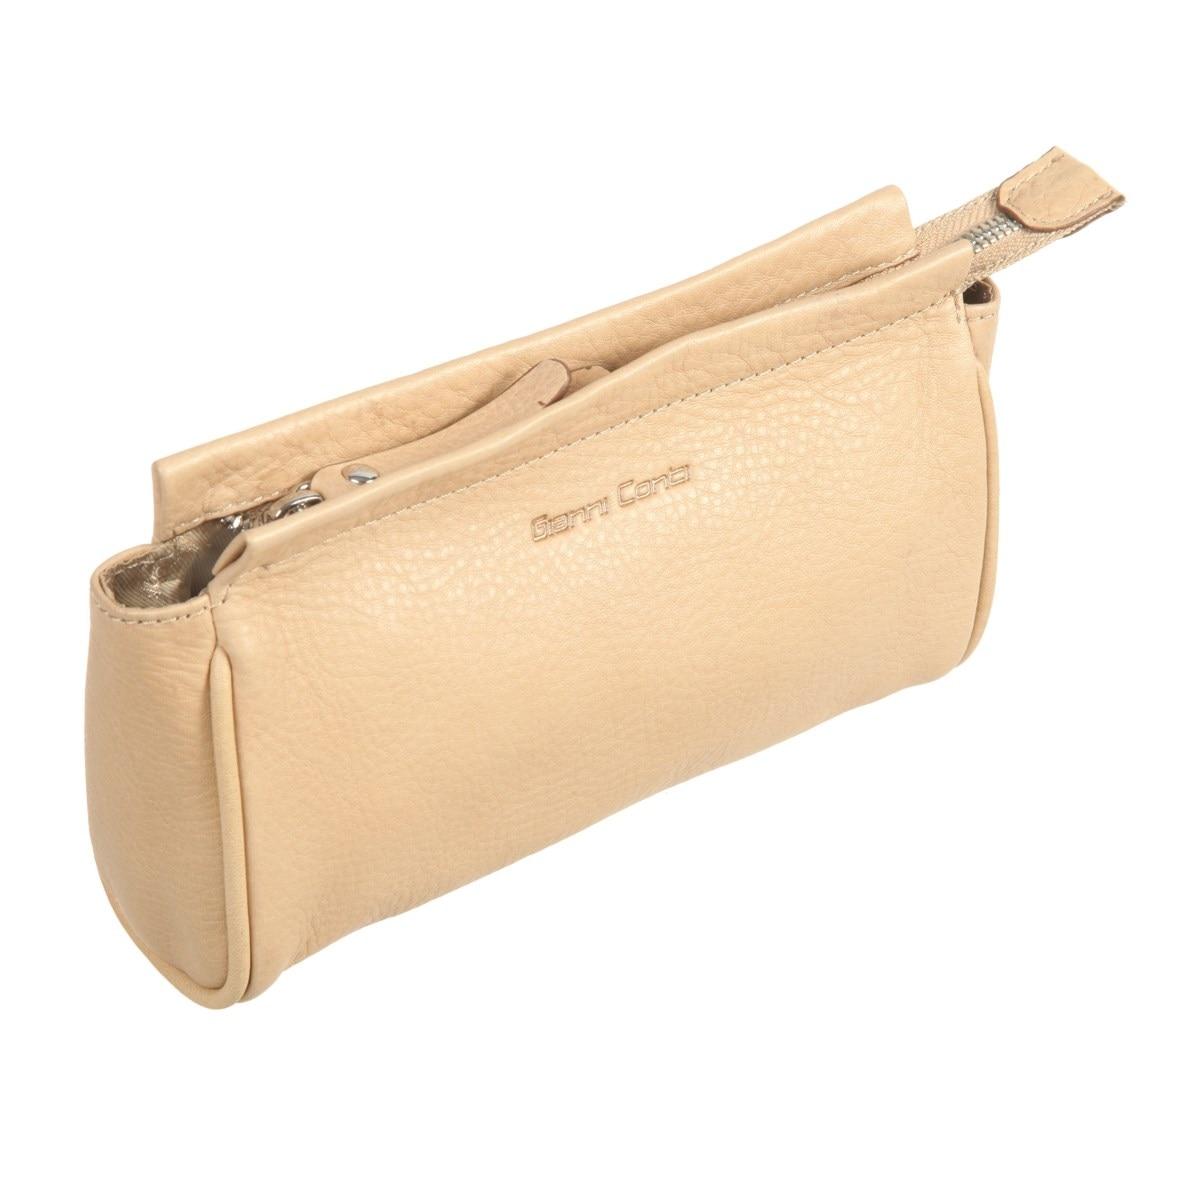 Фото - Make Up Bag Gianni Conti 785197 rope sy16 black professional waterproof outdoor bag backpack dslr slr camera bag case for nikon canon sony pentax fuji